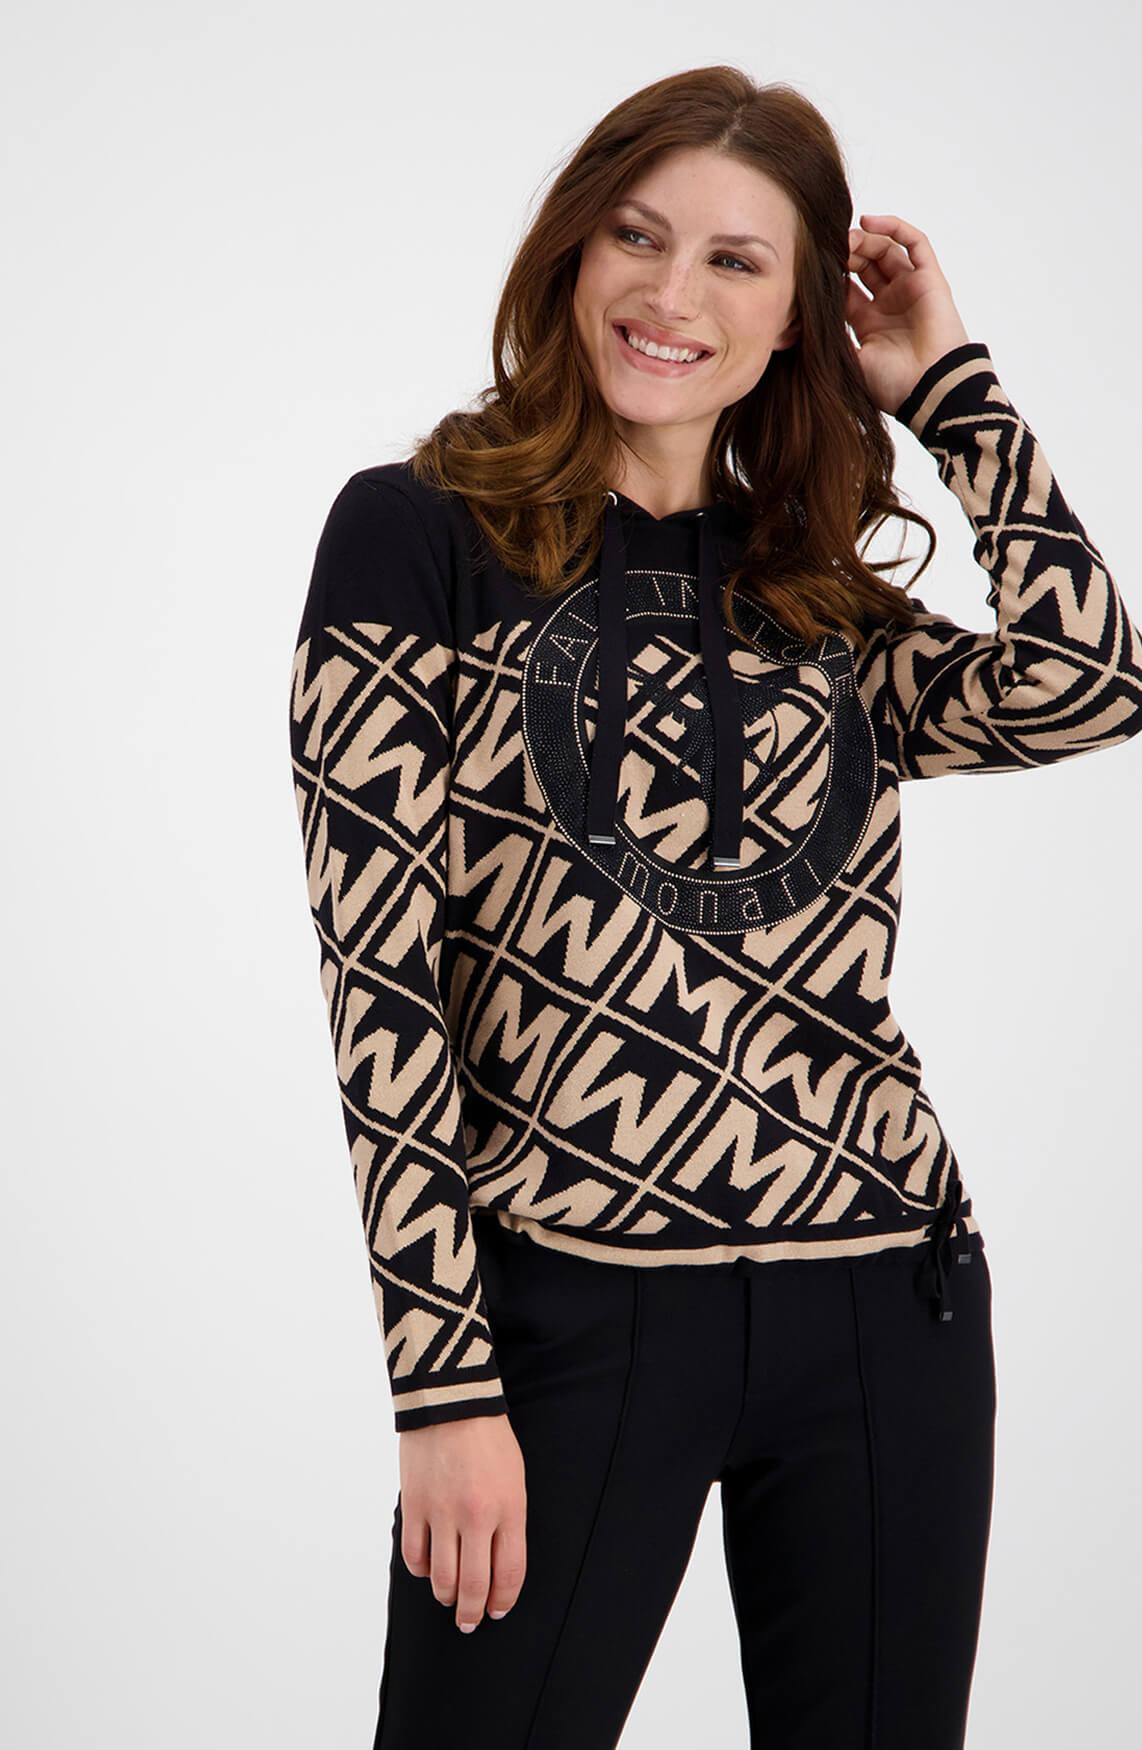 Monari Dames Sweater met strass zwart